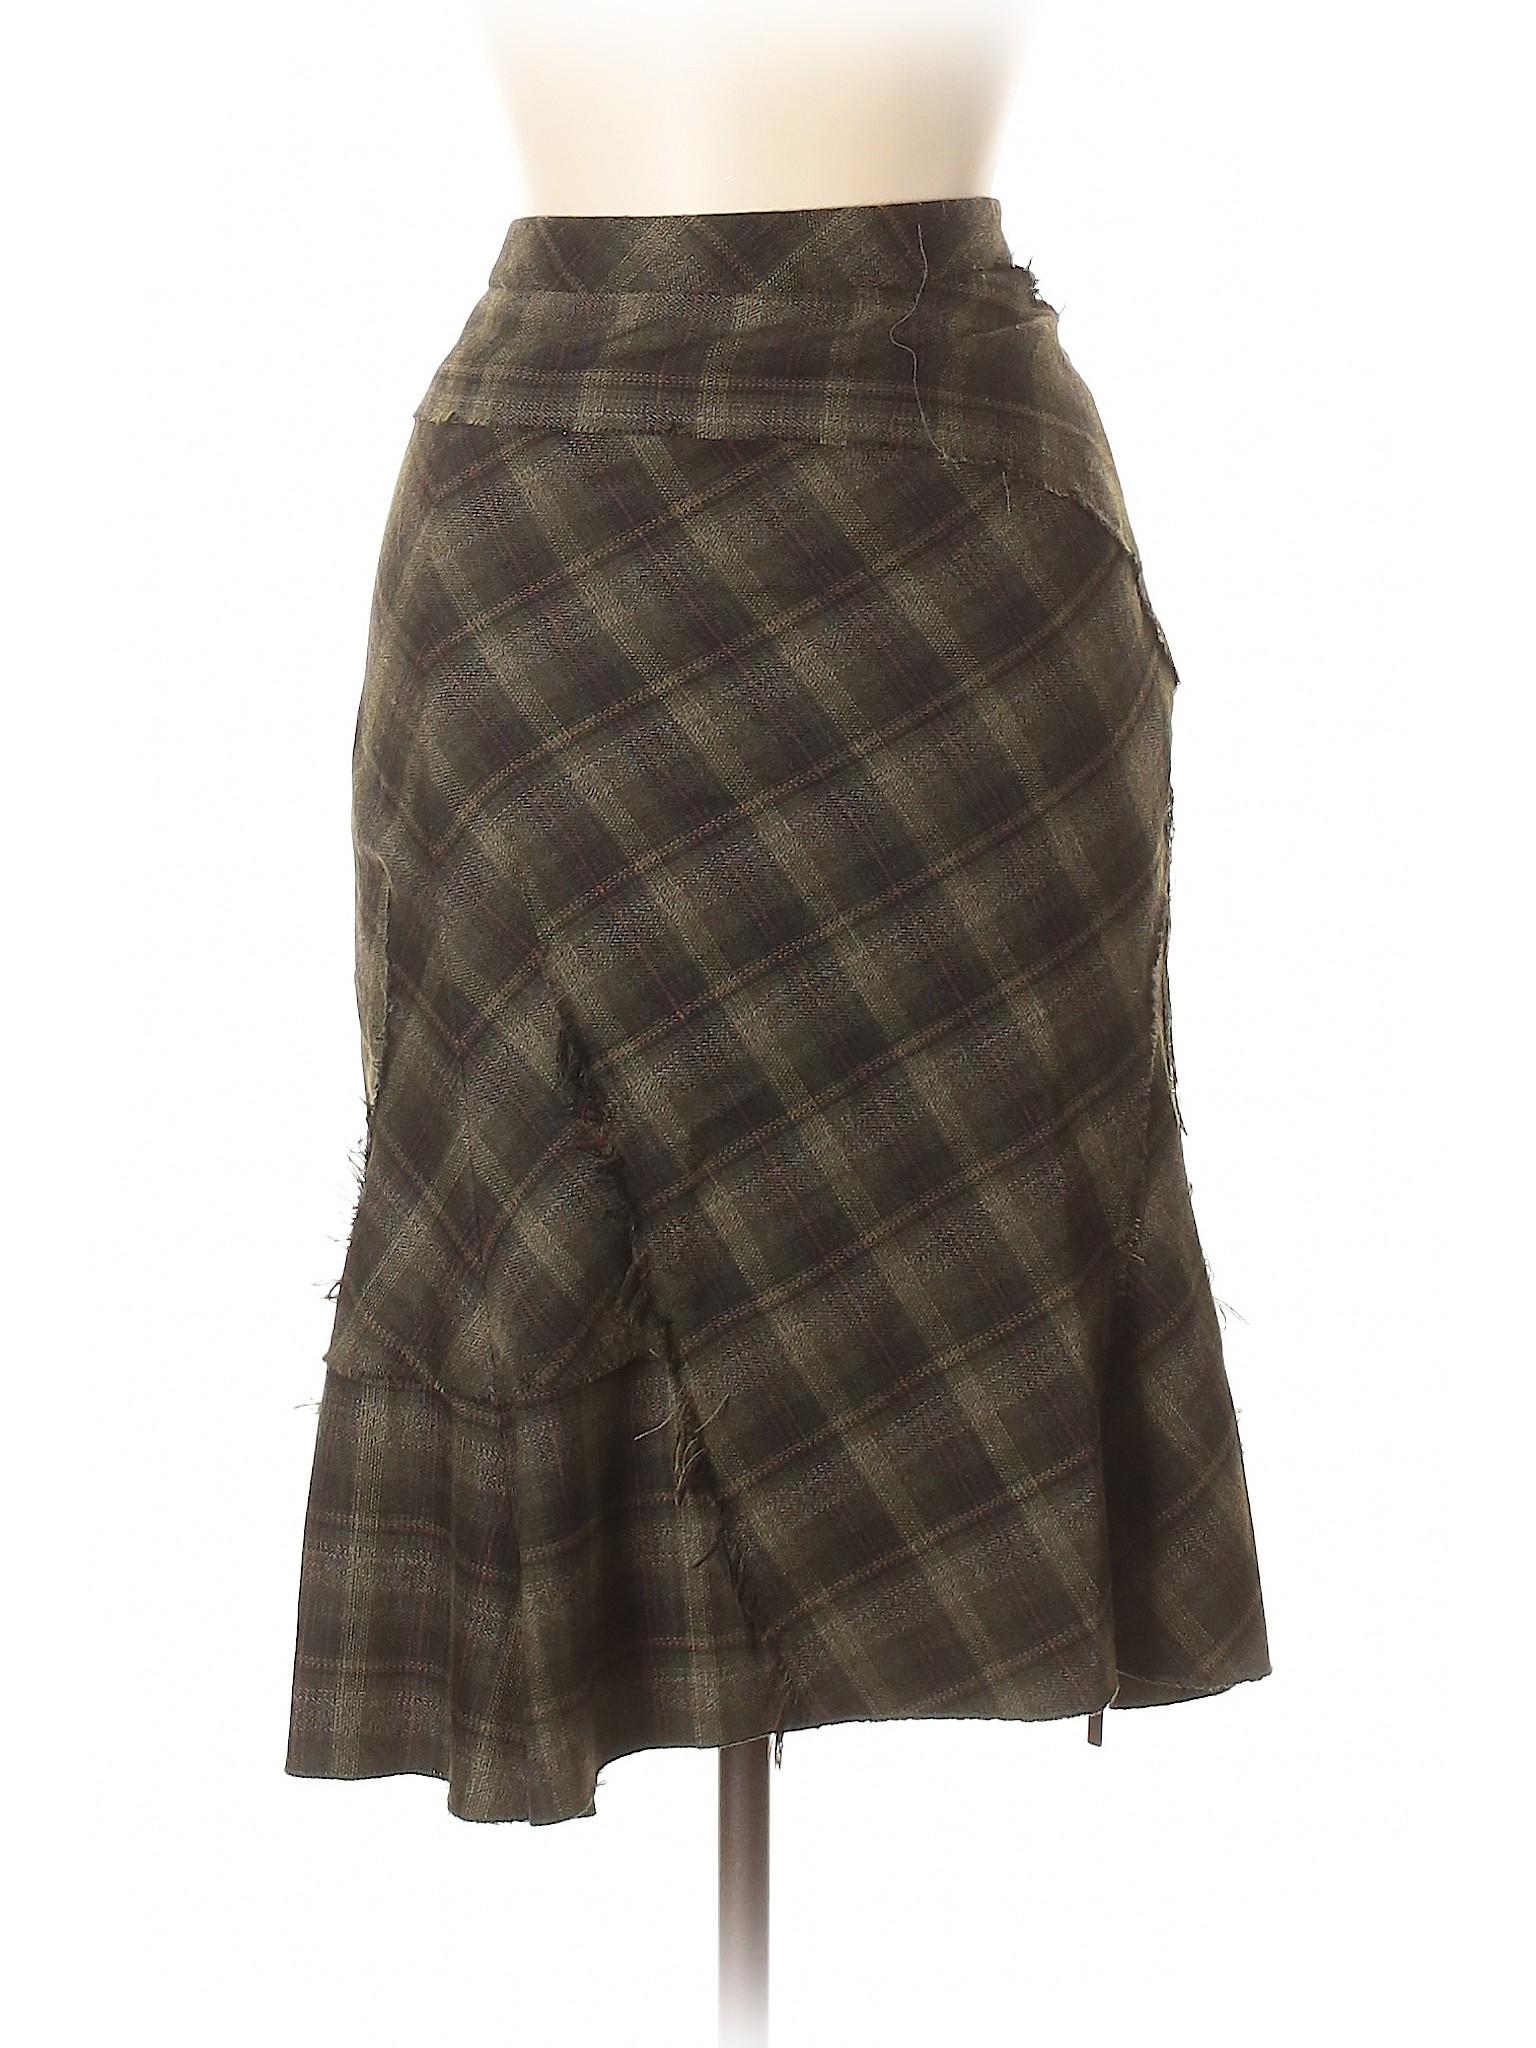 Boutique Skirt Boutique Boutique Skirt Wool Skirt Wool Wool Boutique Wool wYa4xwq7